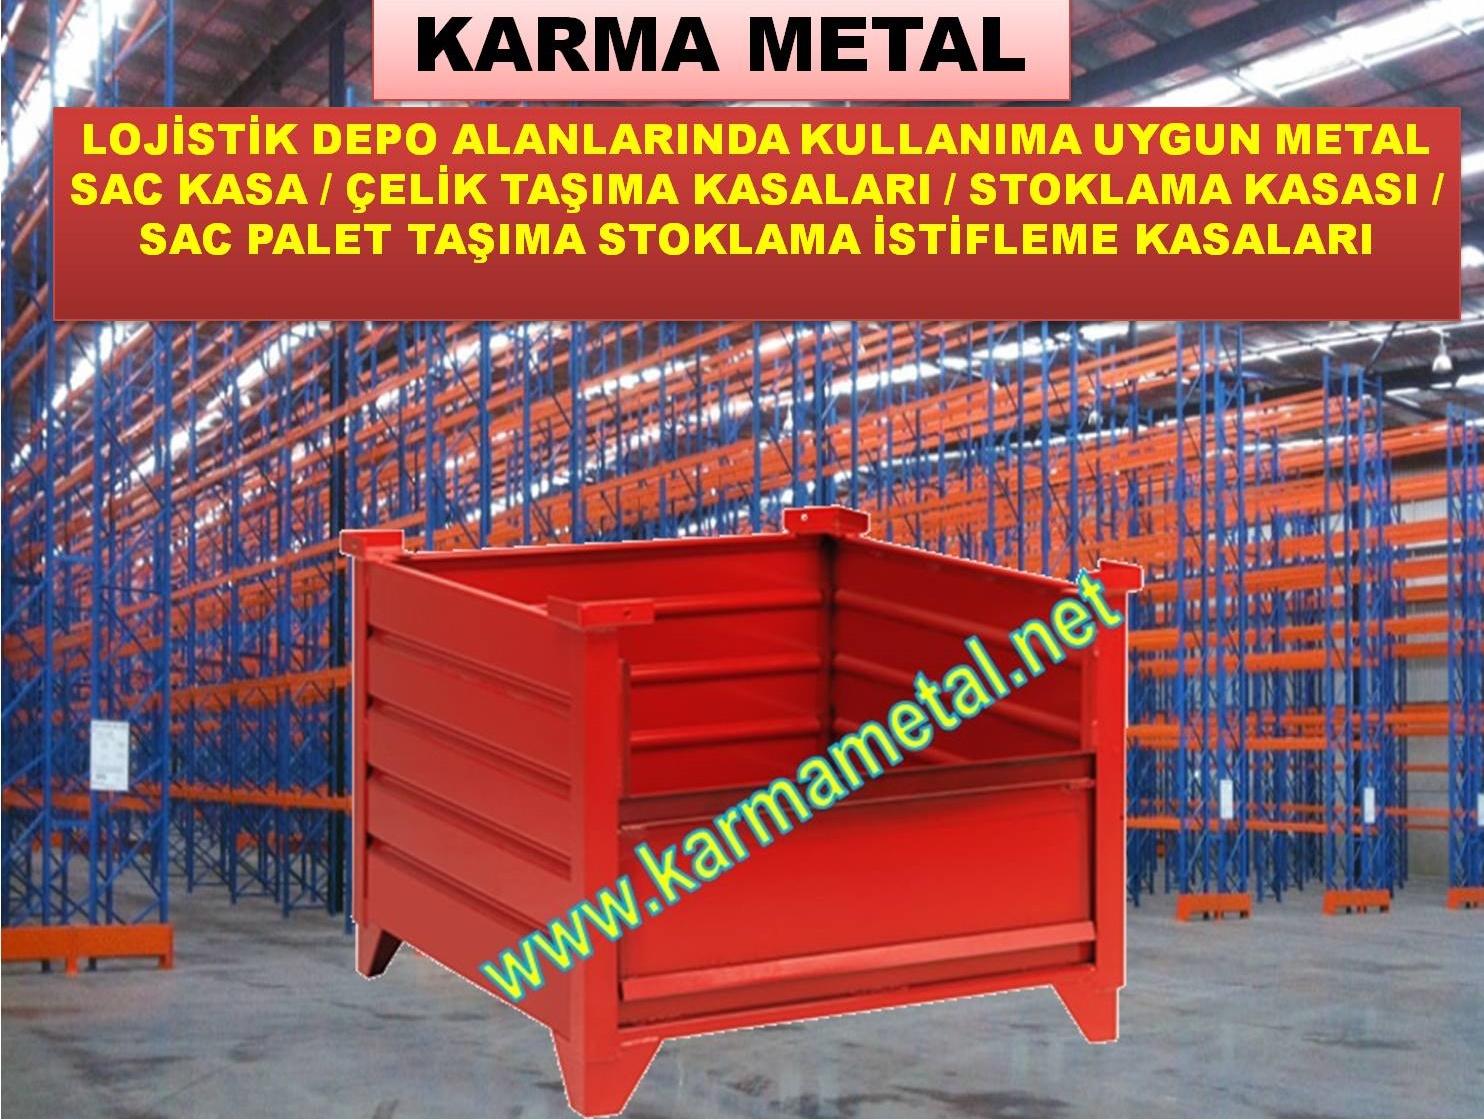 katlanabilir_katlanir__kasa__metal_celik_sac_tasima_stoklama_istifleme__kasasi_kasalari_sandiklari (6)